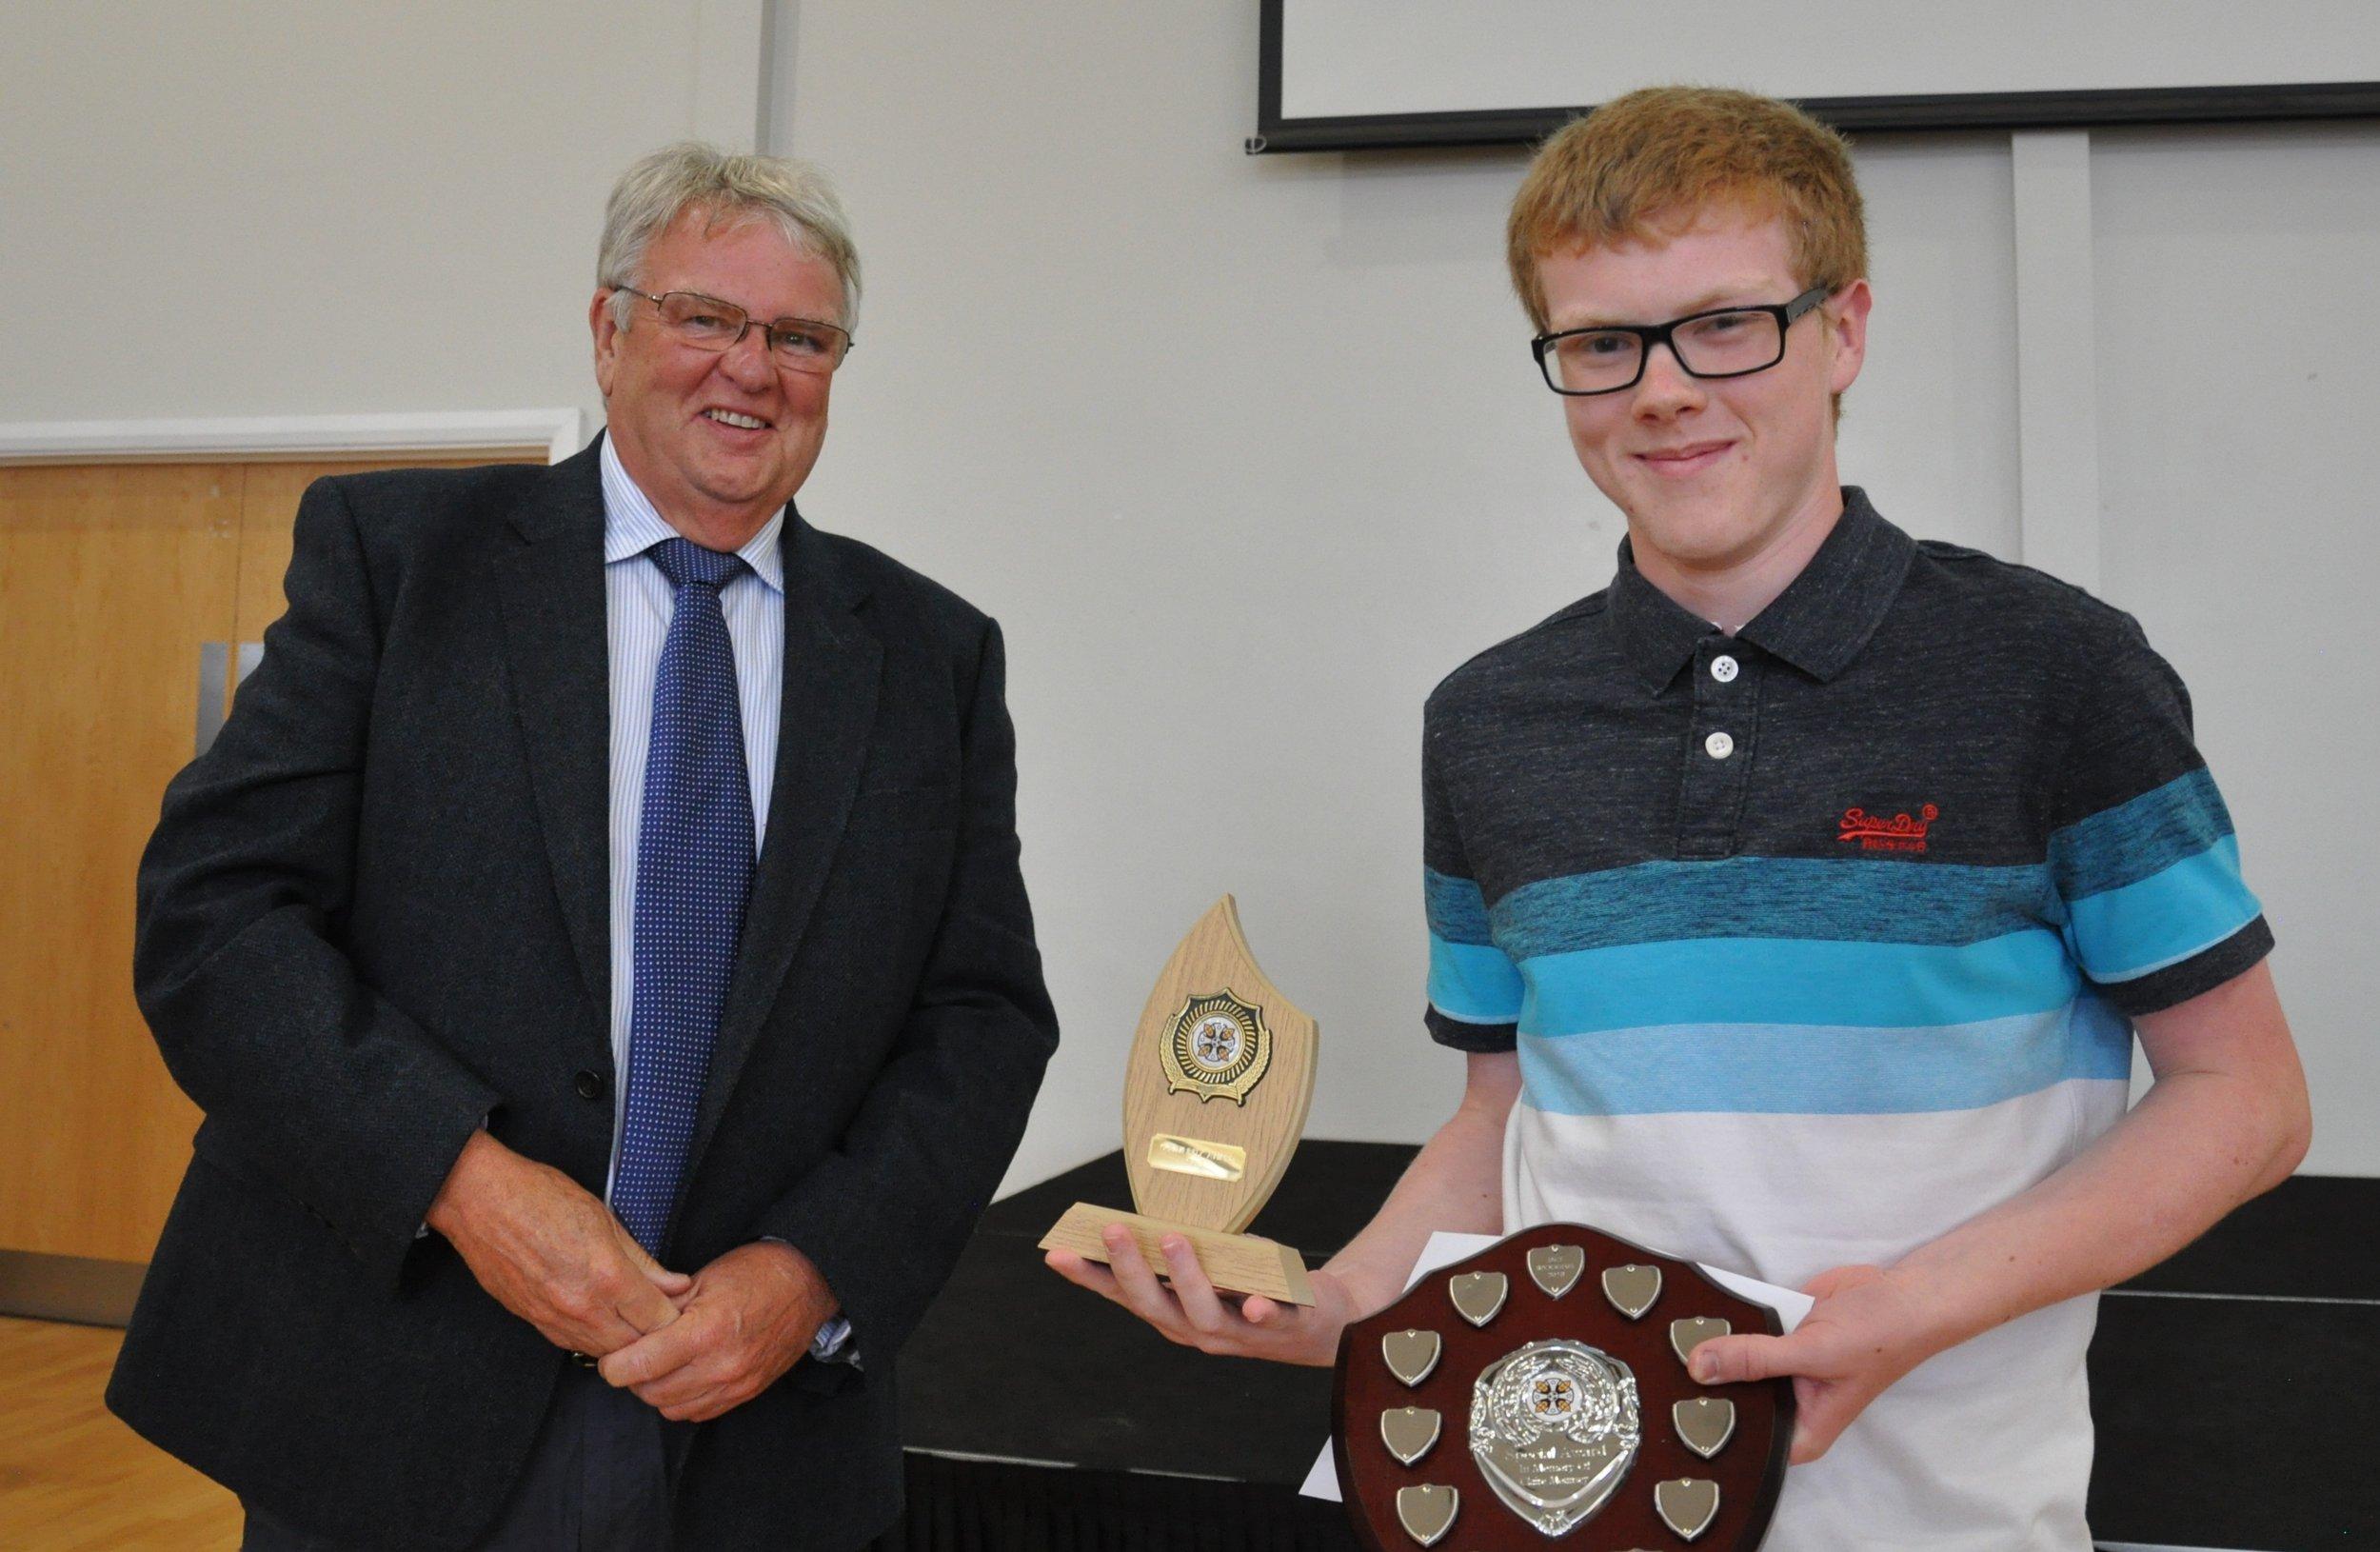 jack Broughal - com award.JPG